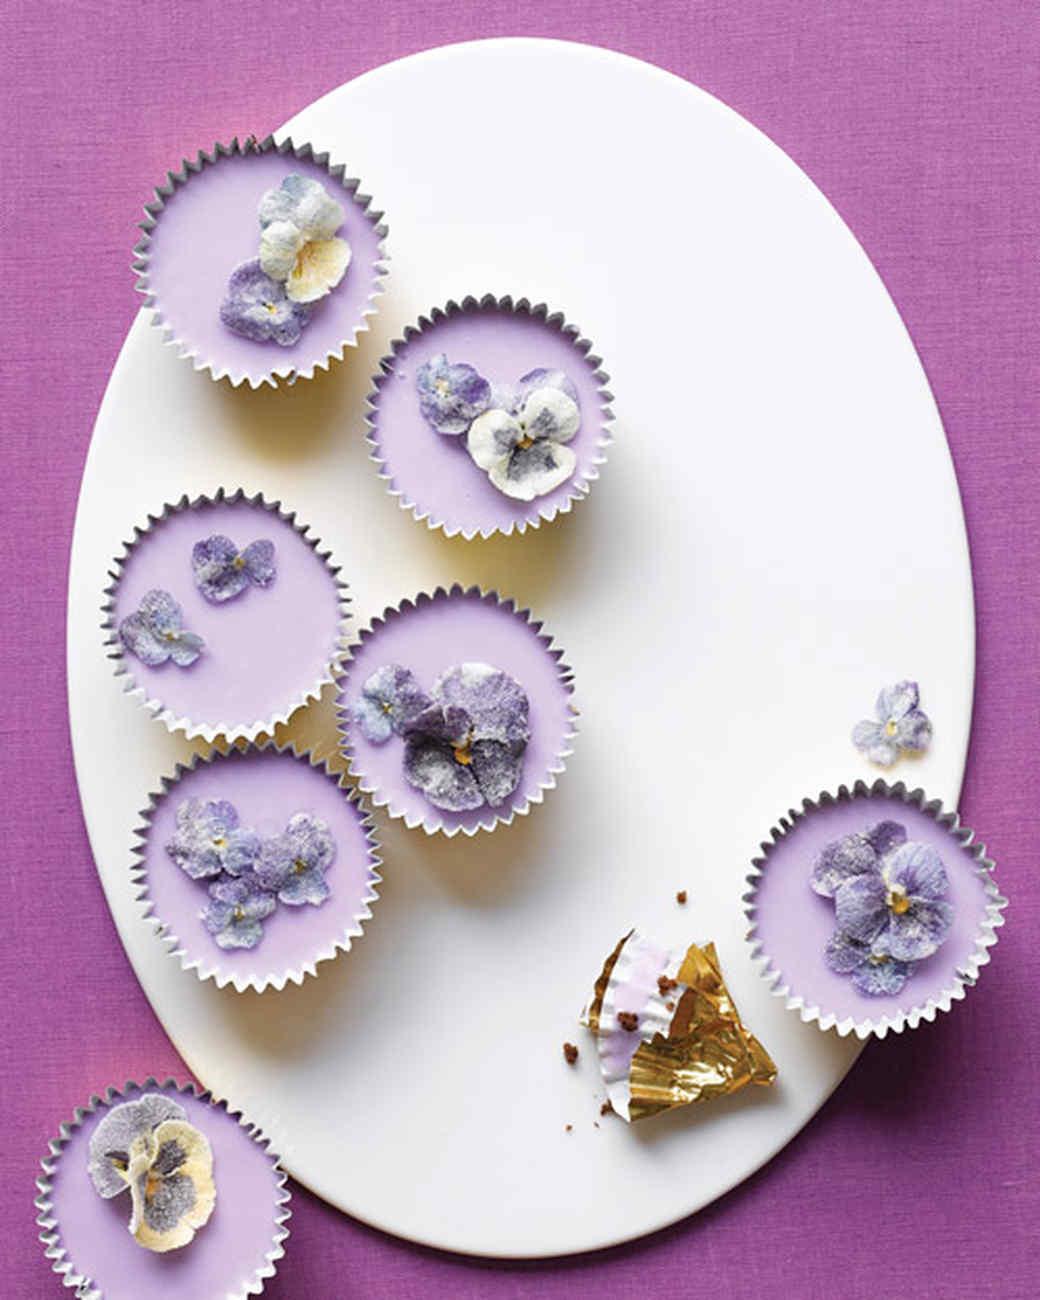 mld102591_0507_cupcakes.jpg